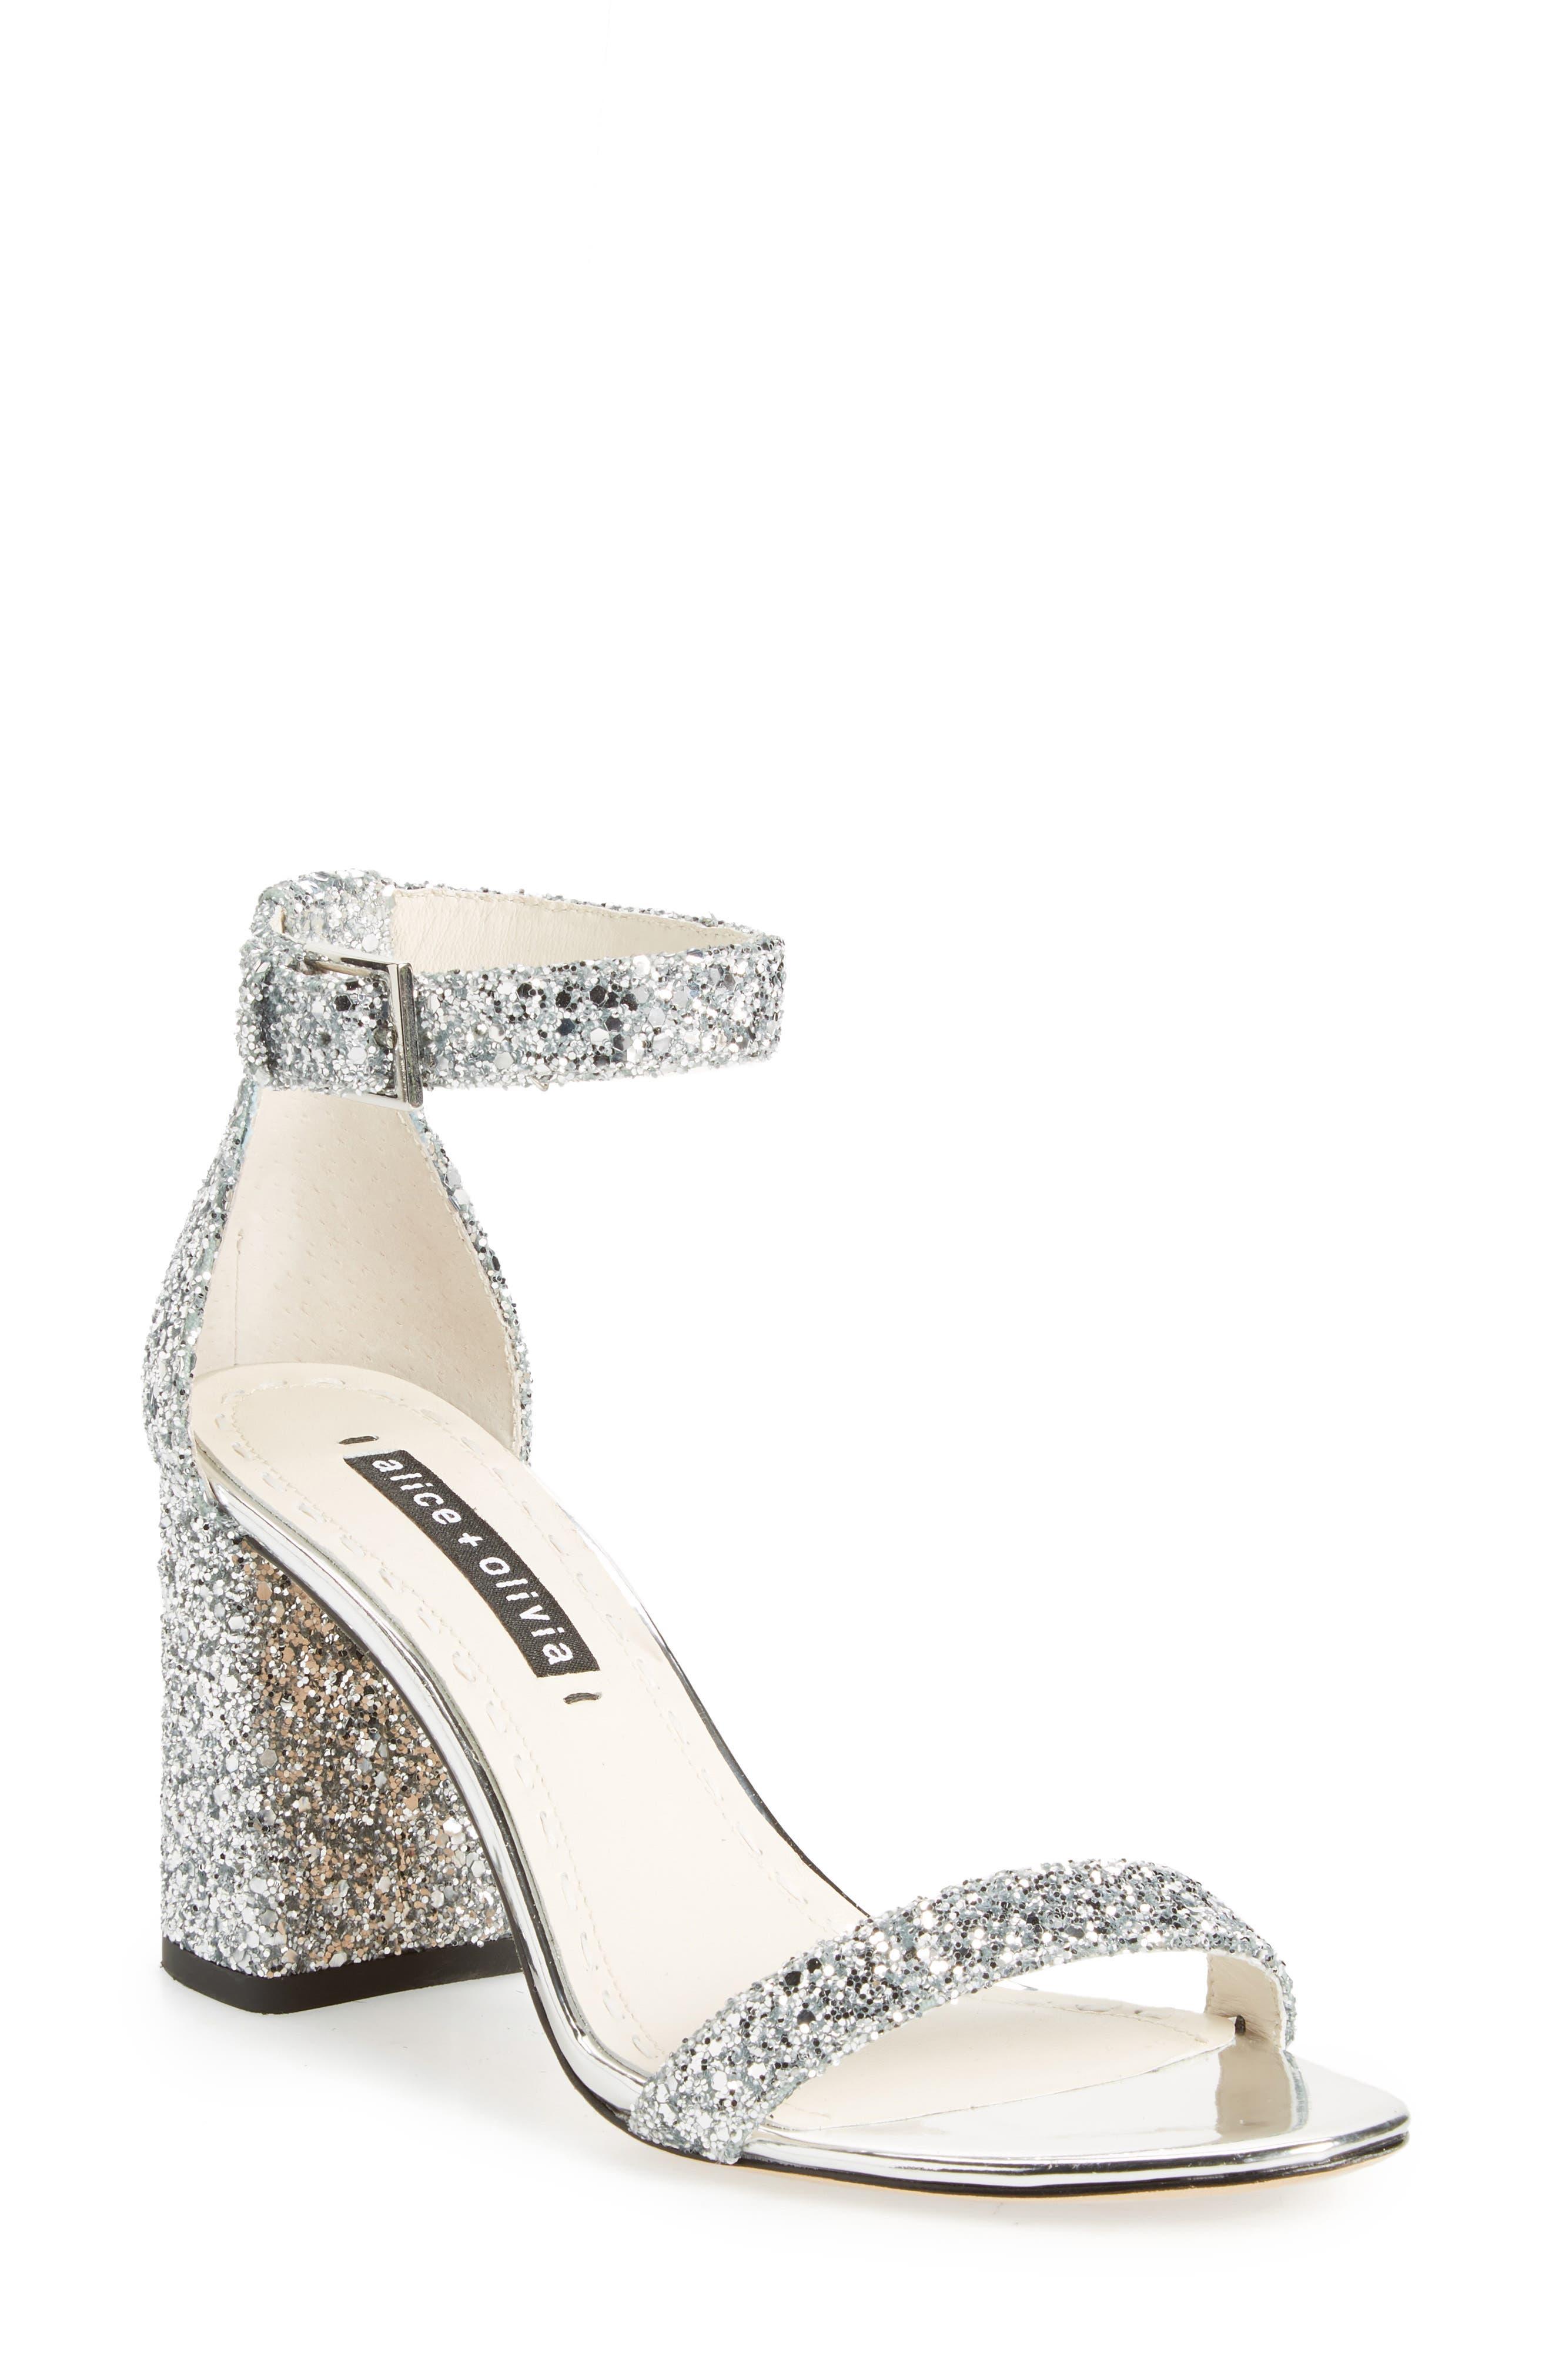 Lillian Glitter Ankle Strap Sandal,                         Main,                         color, 020